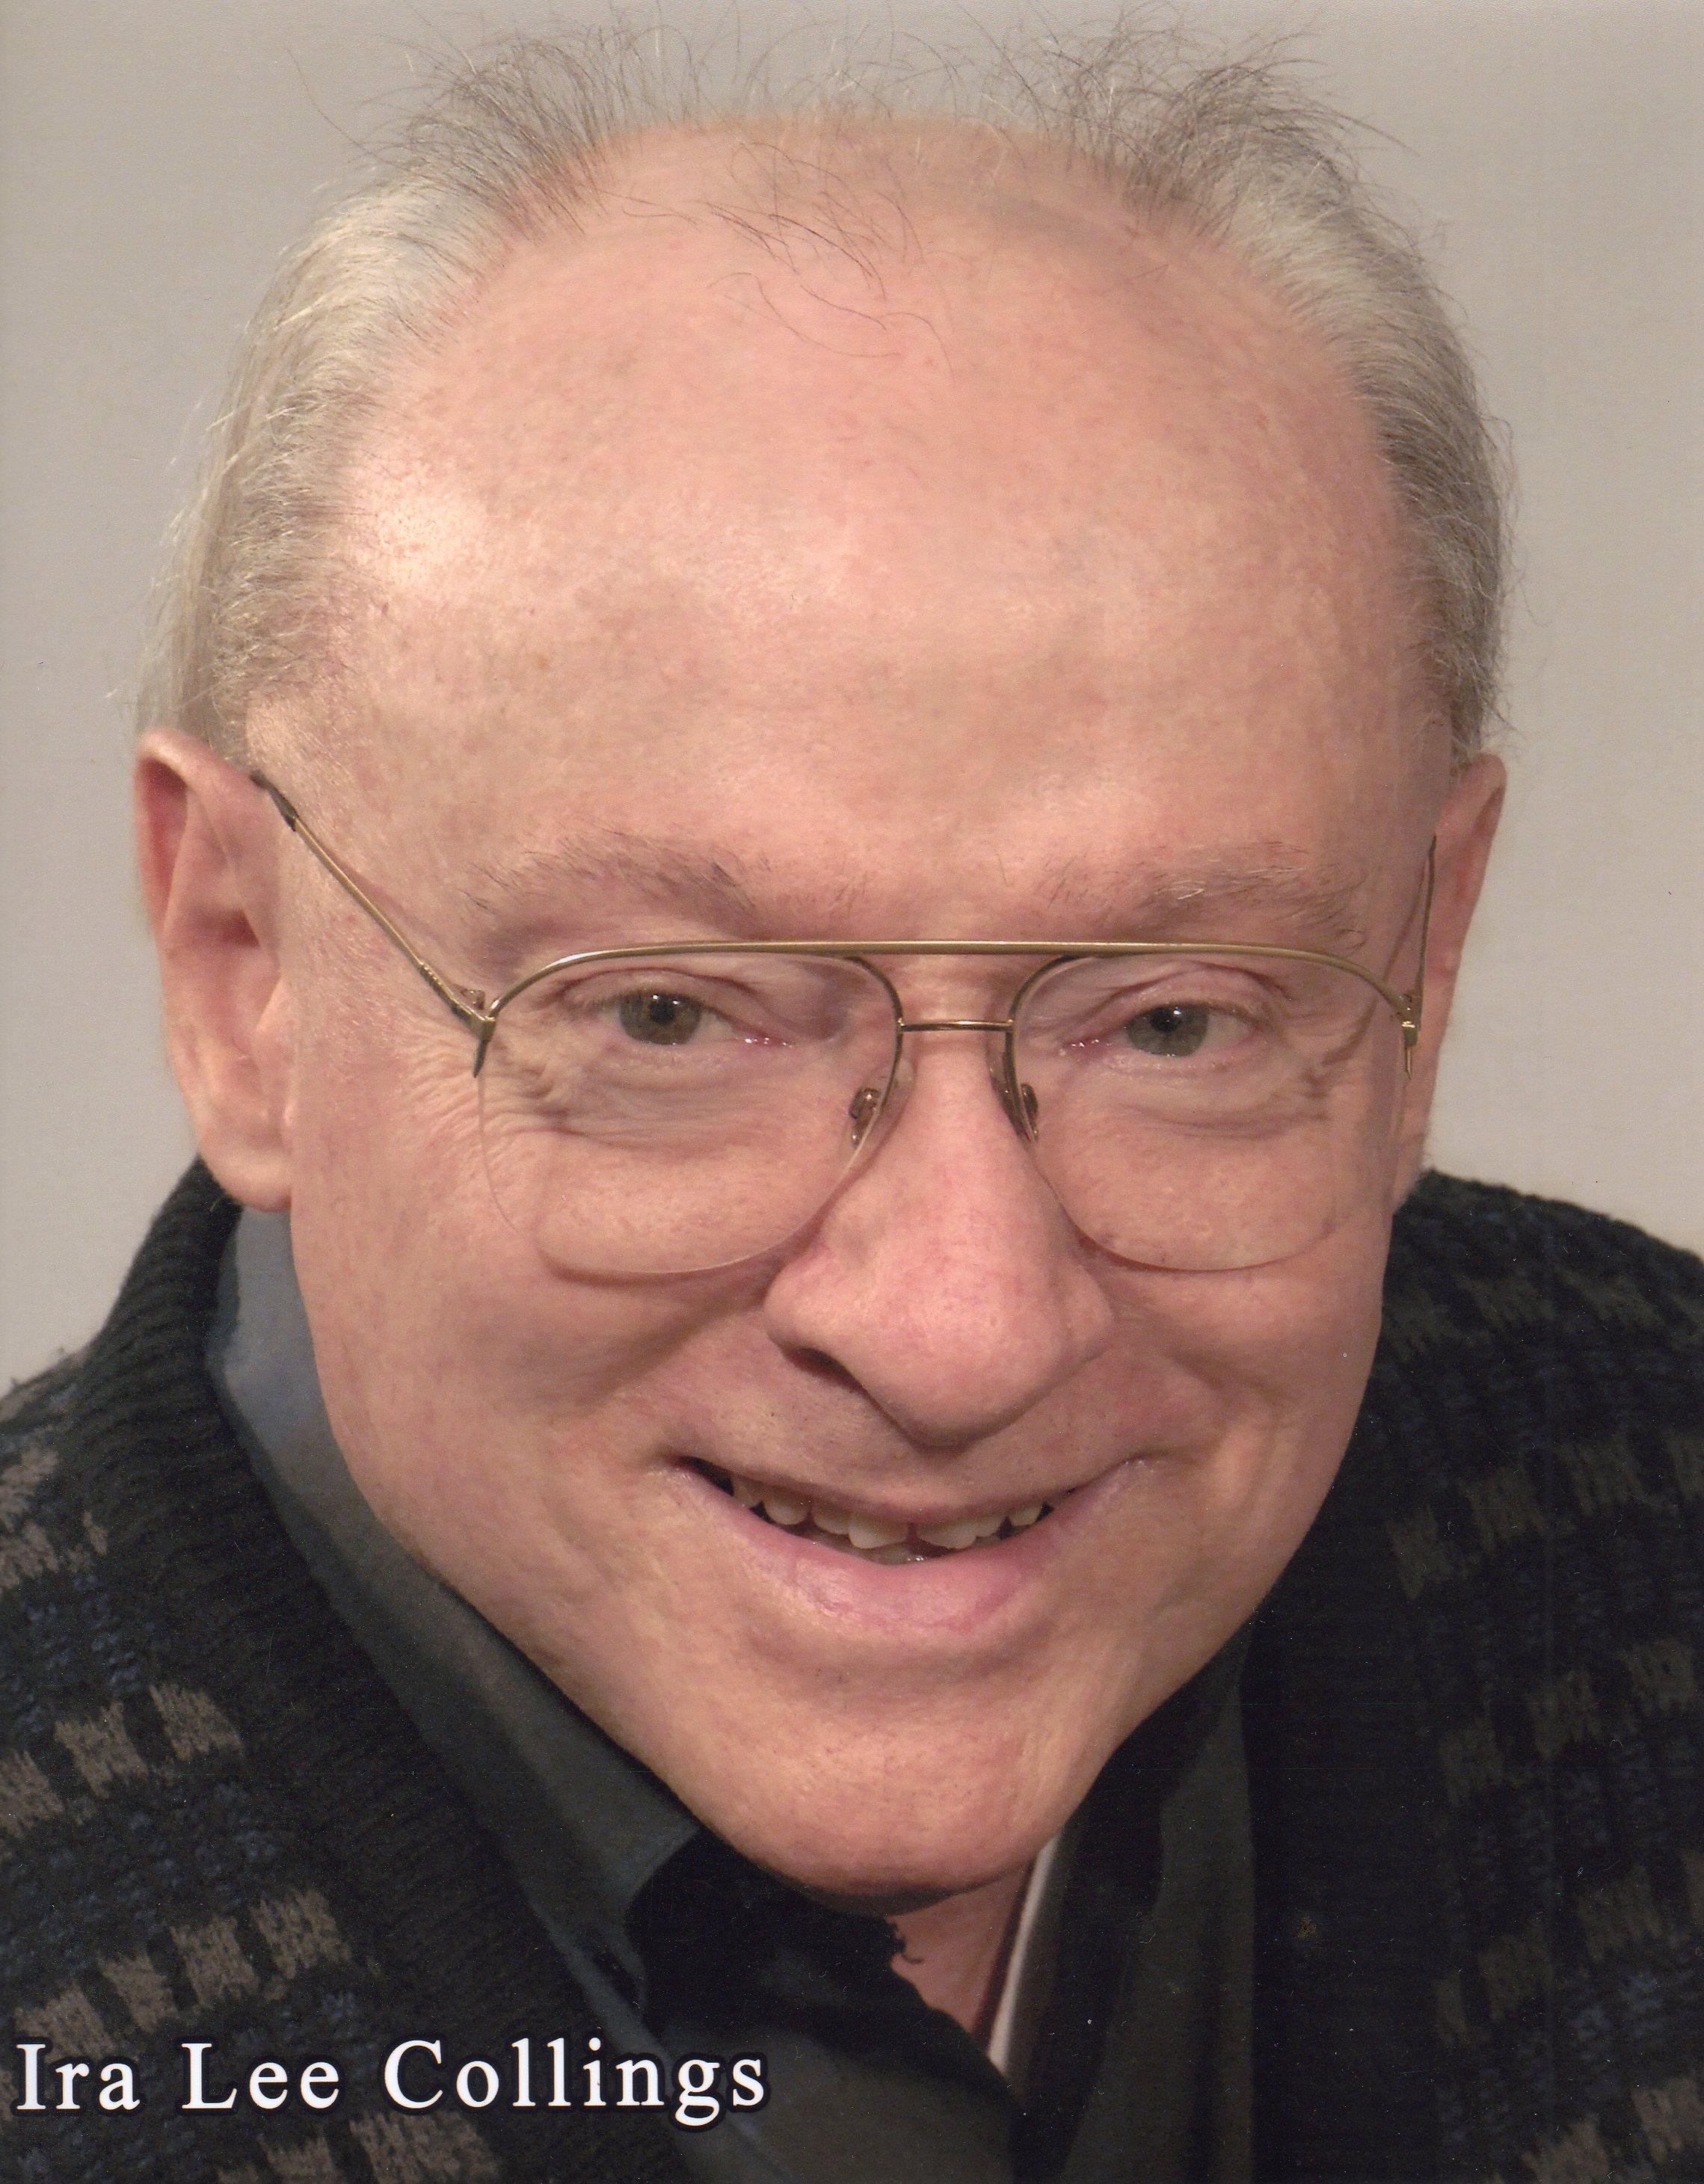 Ira Lee Collings